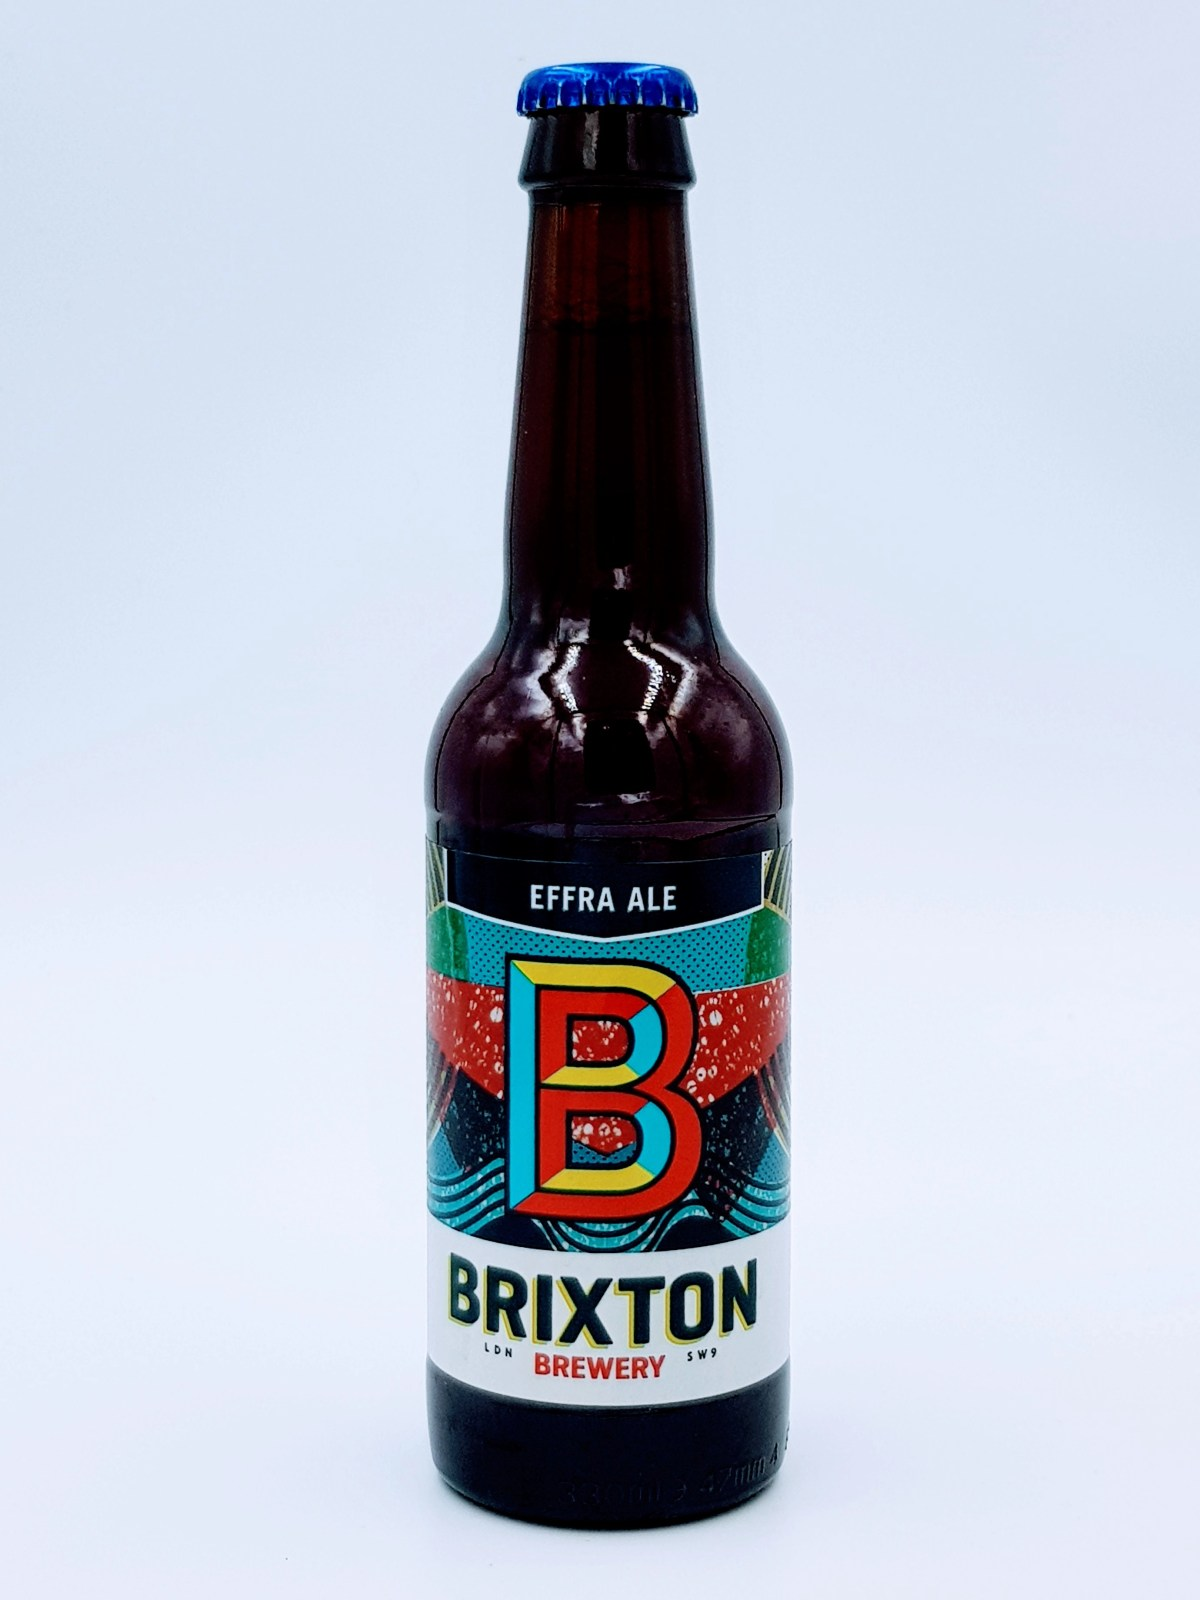 Brixton Brewery Effra Ale